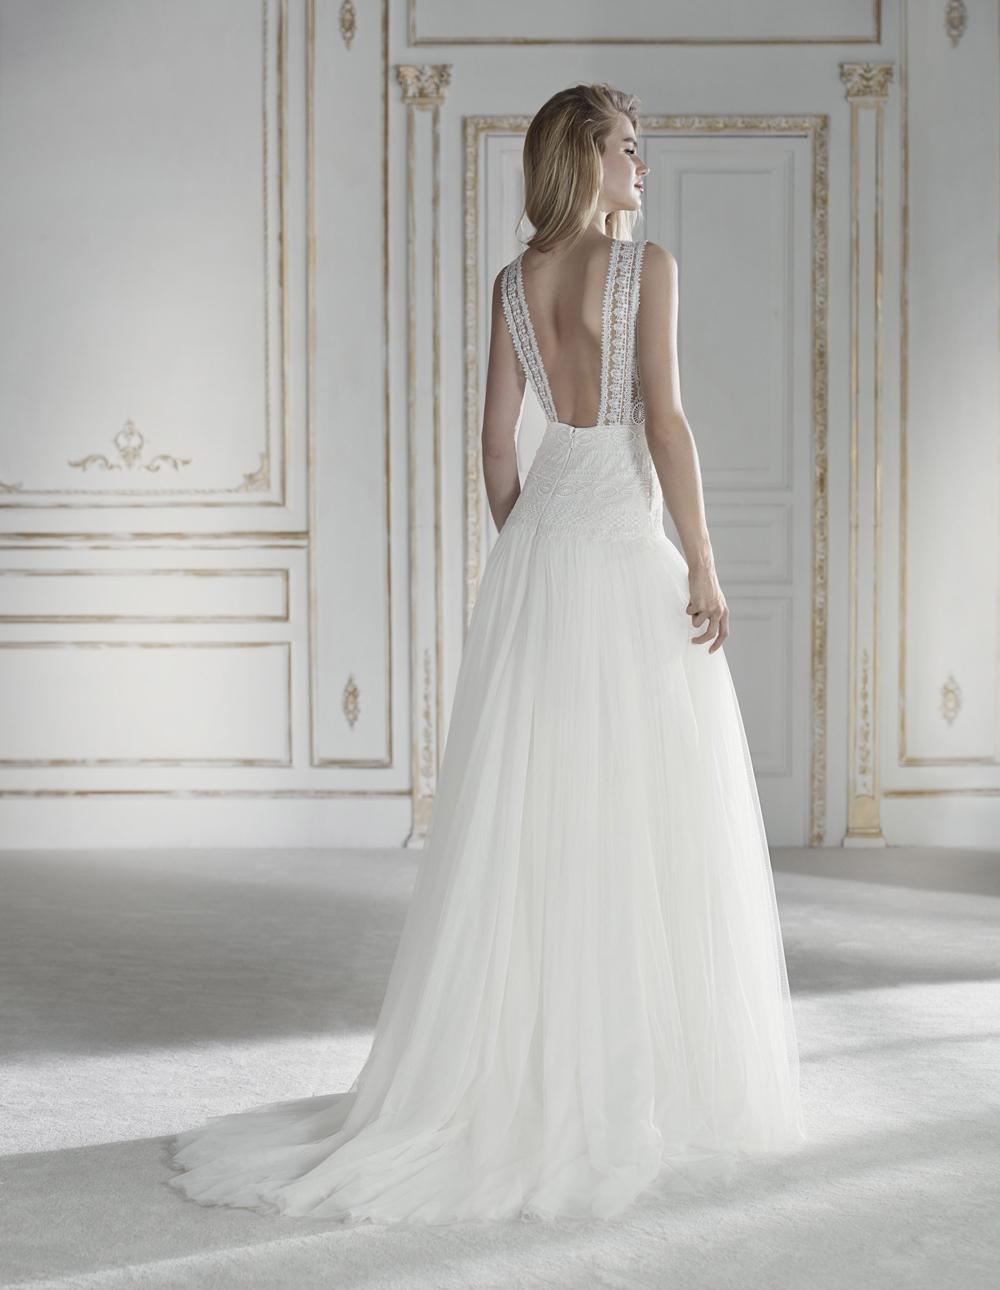 Vestiti Da Sposa Schiena Scoperta.7 Incantevoli Abiti Da Sposa Con La Schiena Scoperta